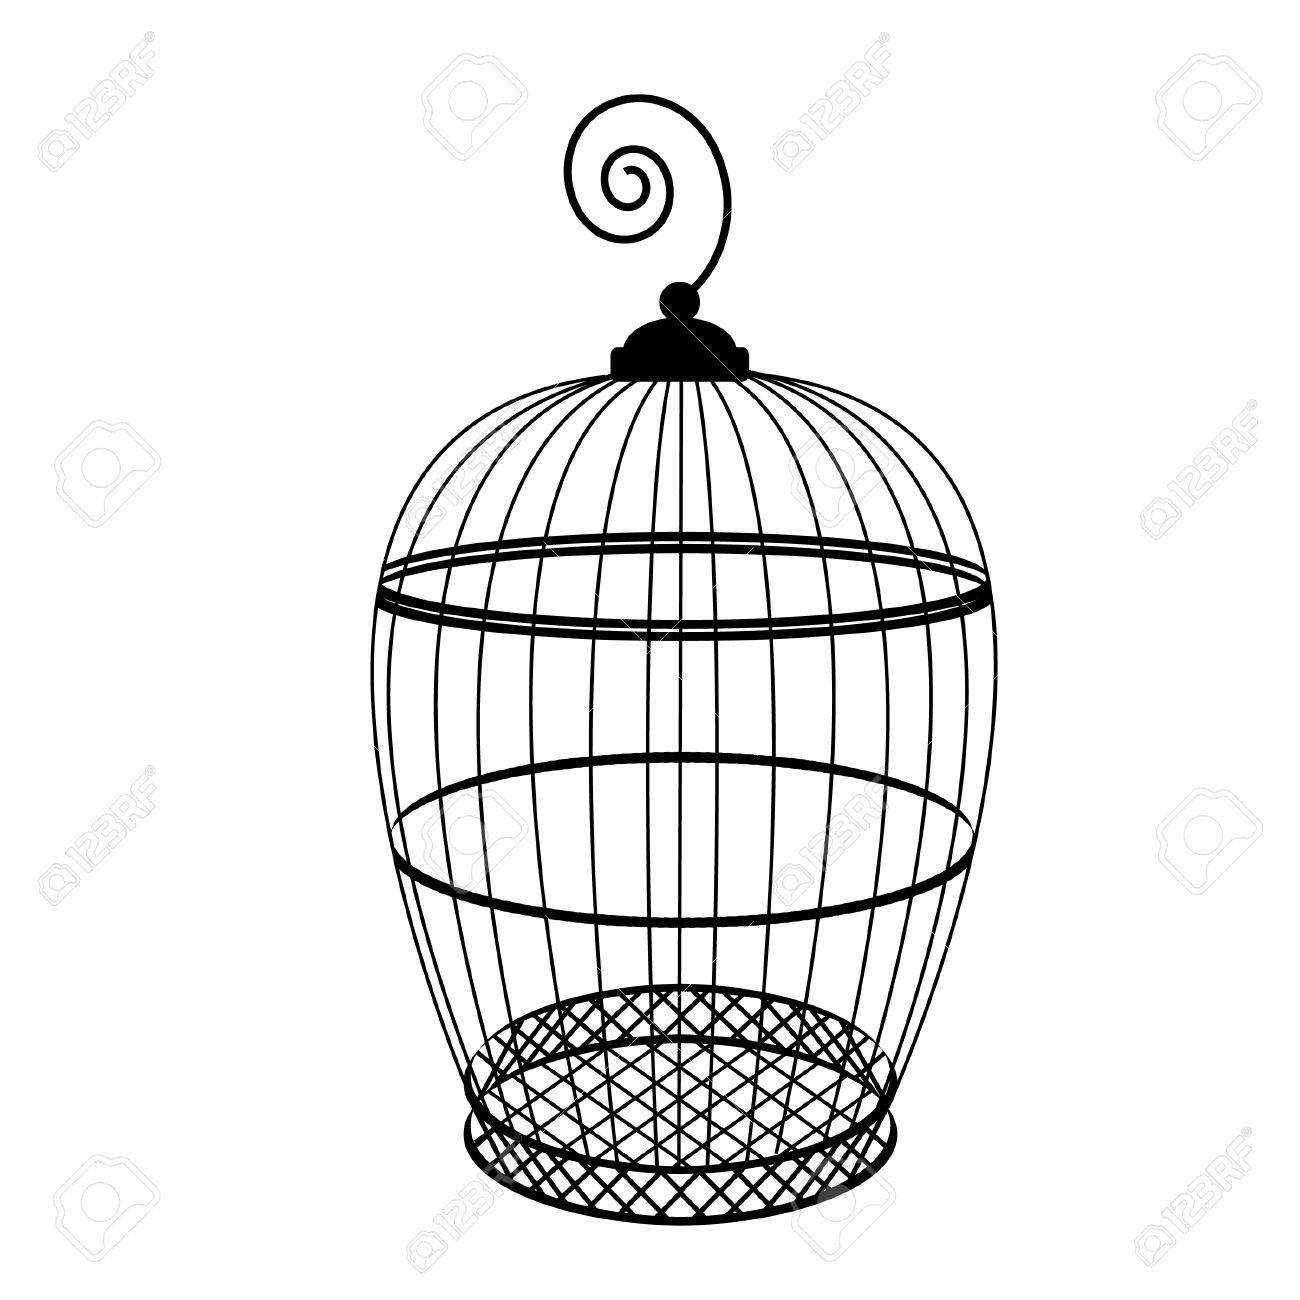 1300x1300 Birdcage Raster Isolated, Bird Cage Silhouette, Vintage Birdcage